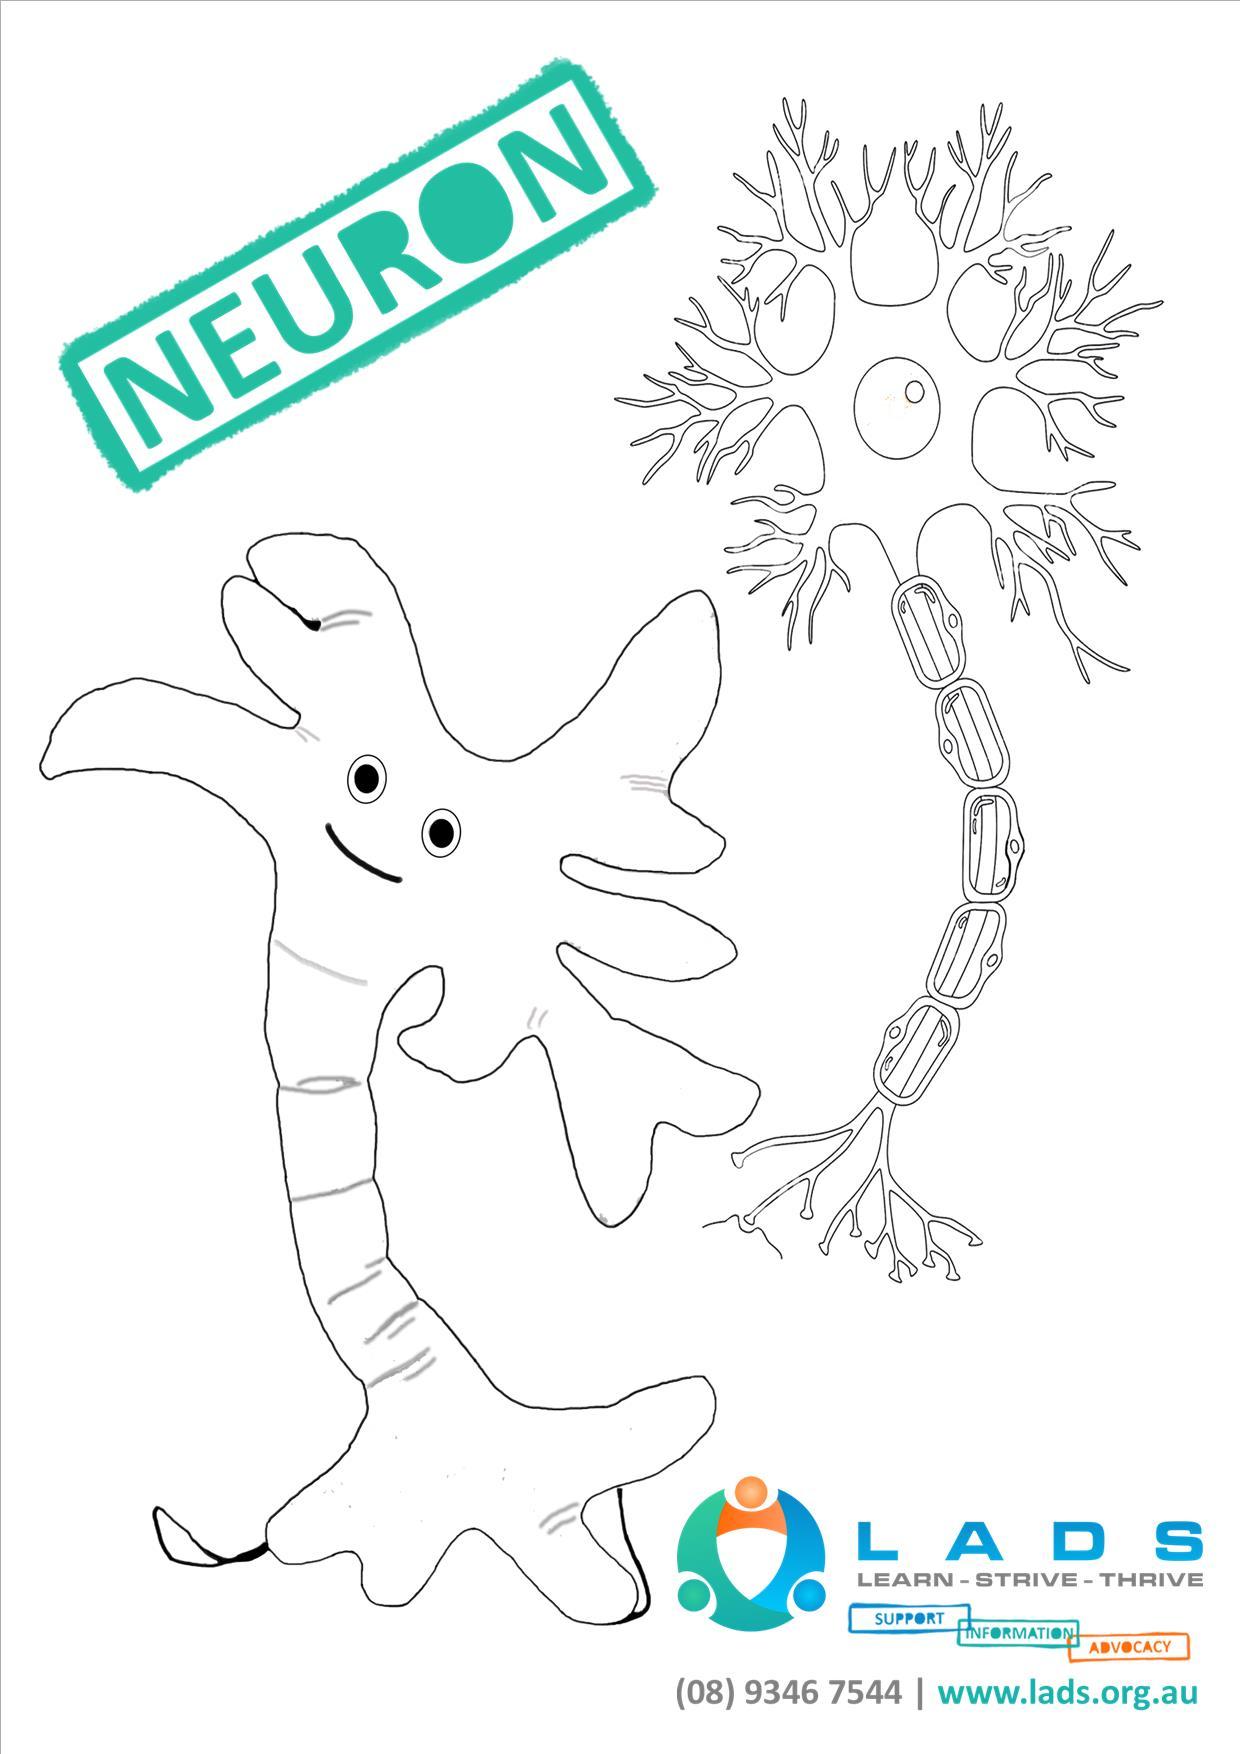 20160422_Neurons_A4.jpg